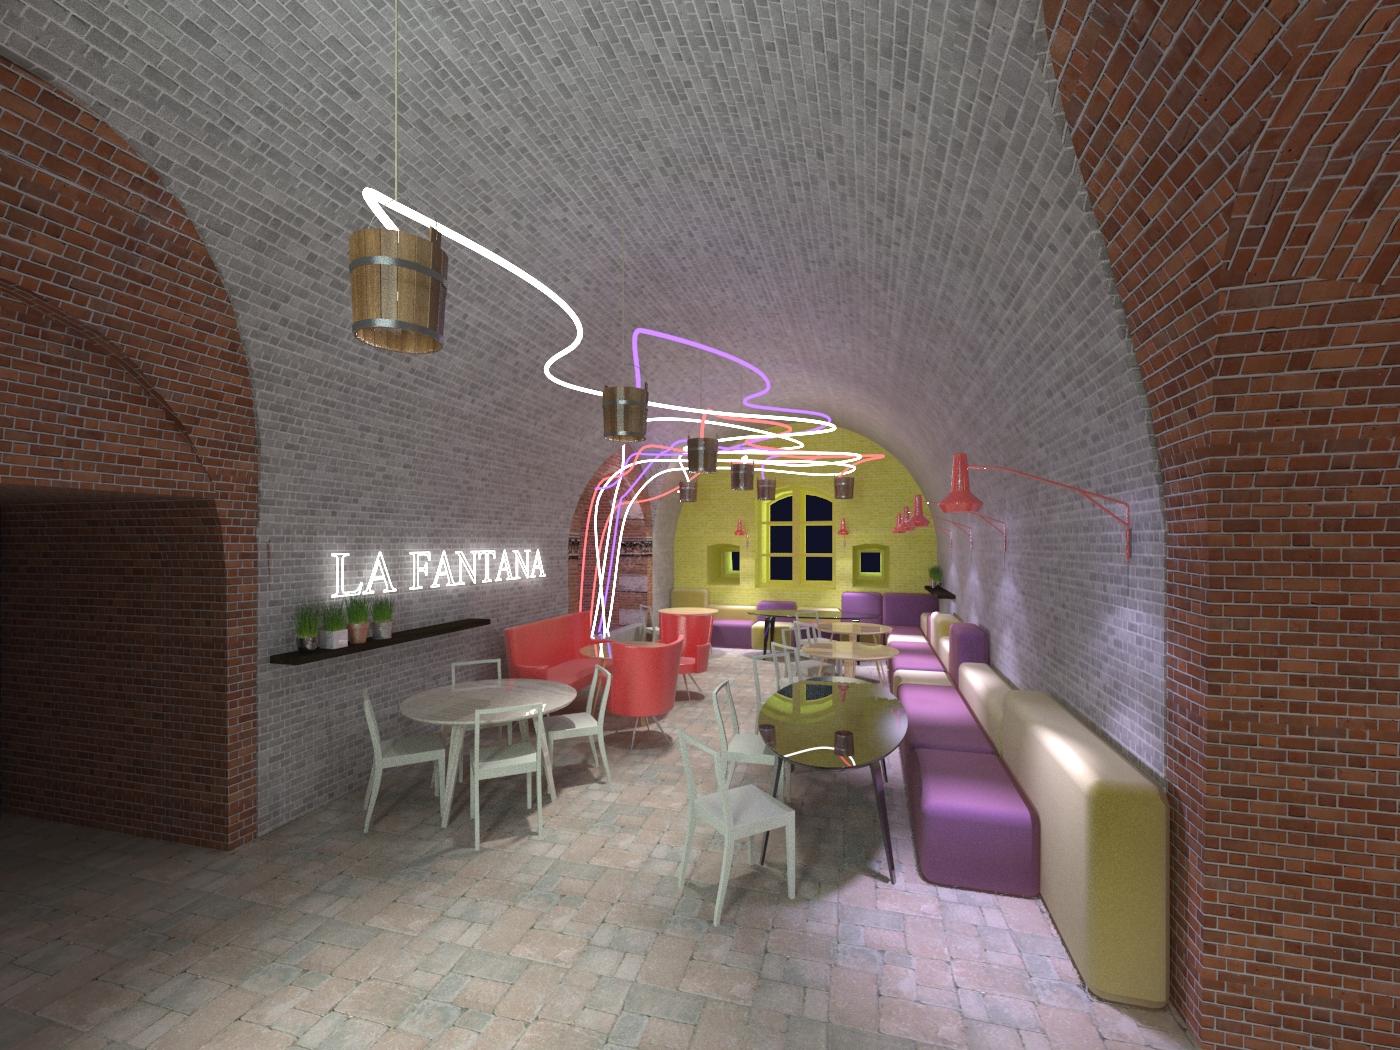 https://nbc-arhitect.ro/wp-content/uploads/2020/10/NBC-Arhitect-_-Ryma-Club-_-Alba-Iulia-Romania-_-interior-design-view_2.jpg